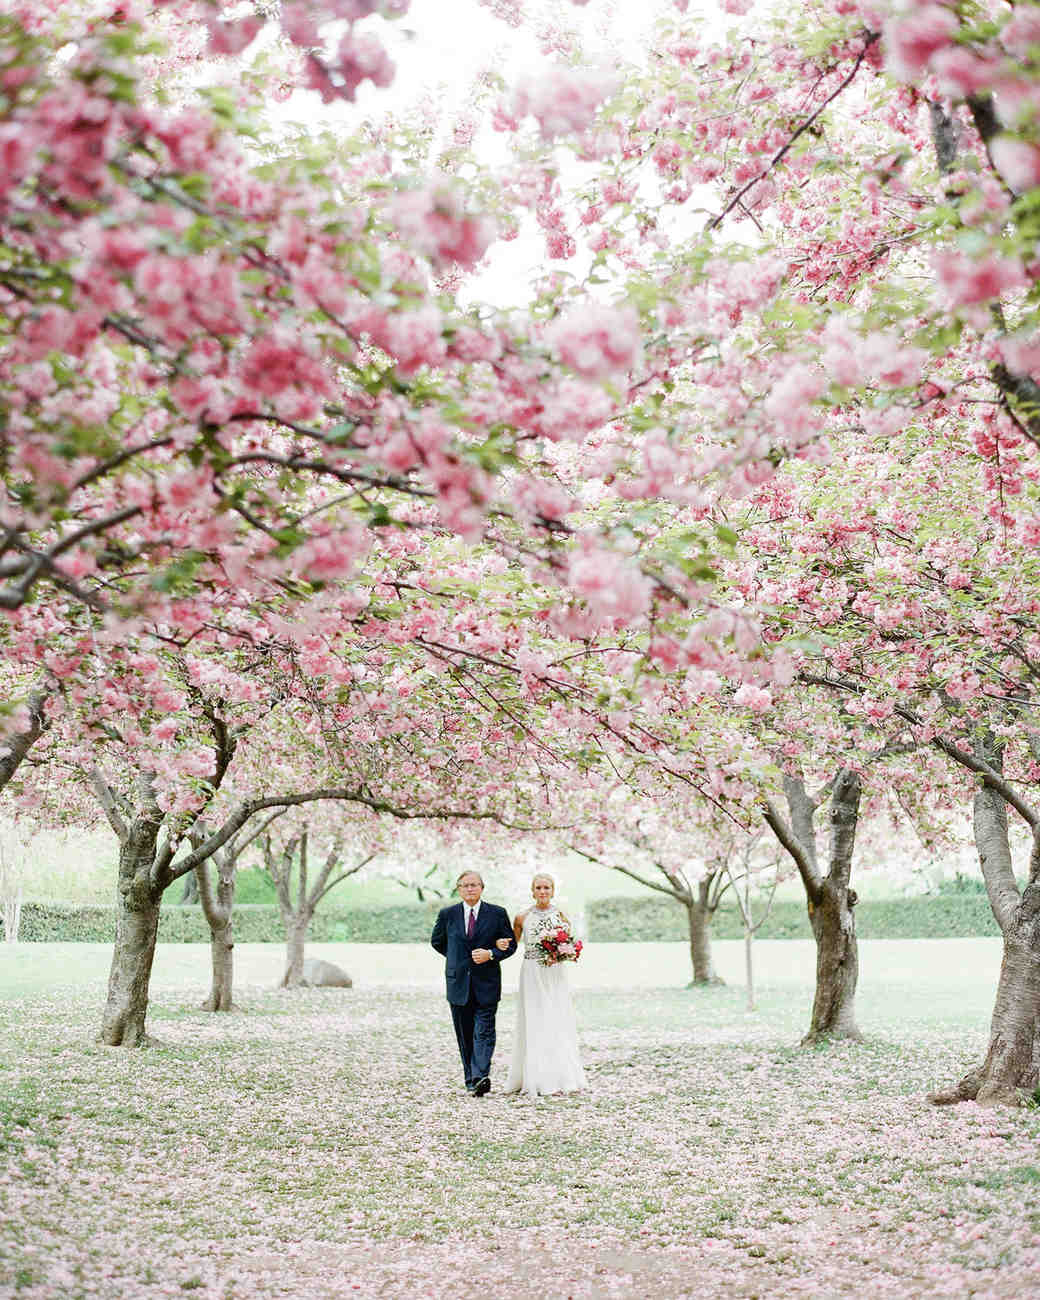 randy-mayo-celebrations-heather-waraksa-cherry-blossoms-dad-0311-s112716.jpg